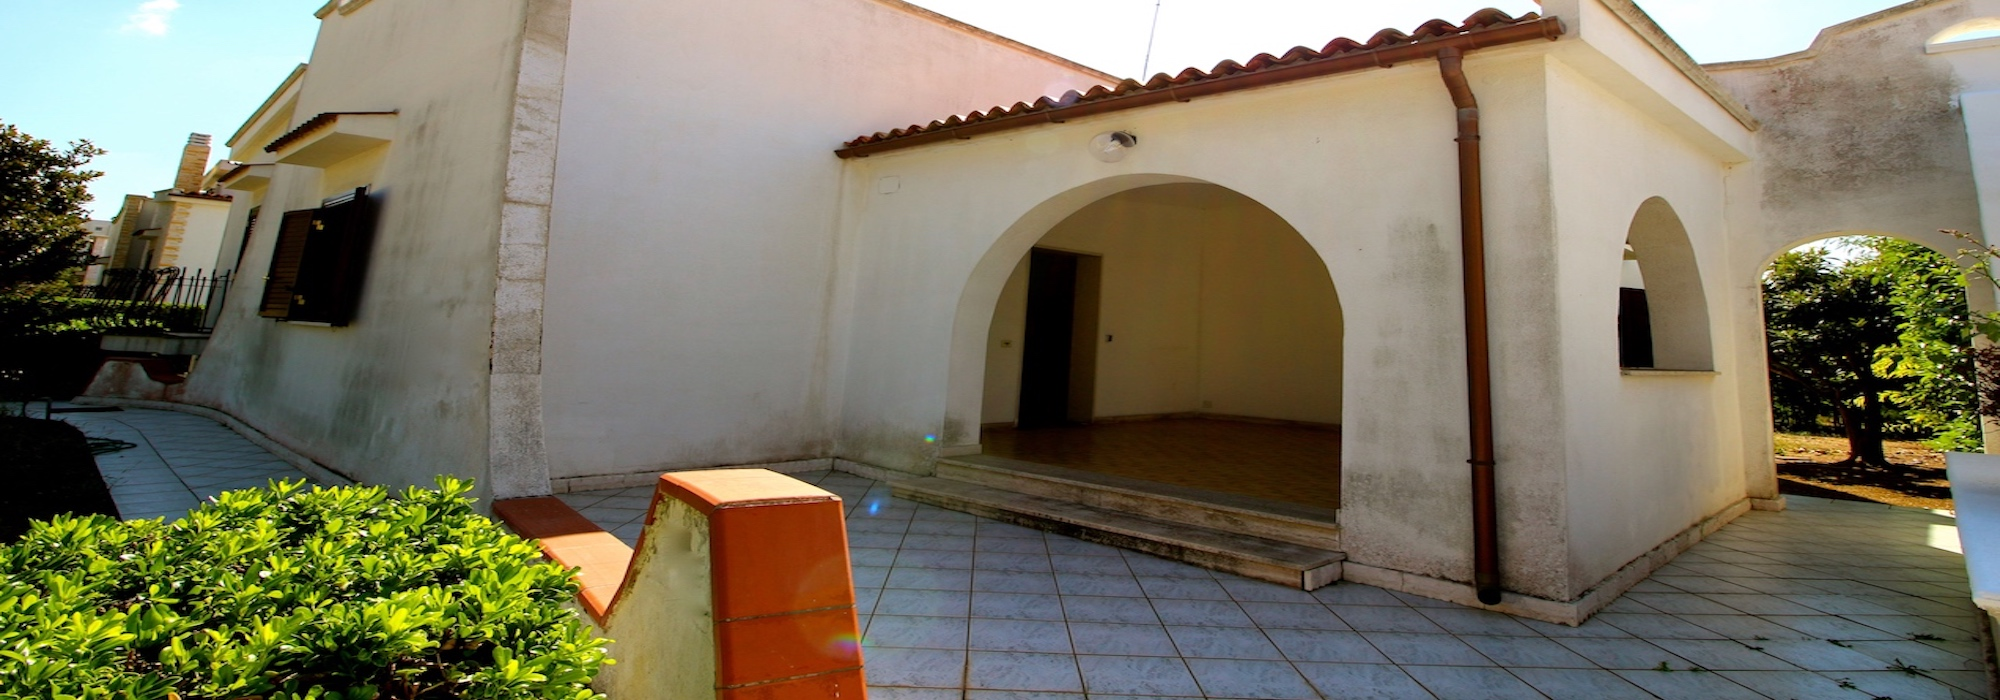 Lama – Villa con giardino e taverna